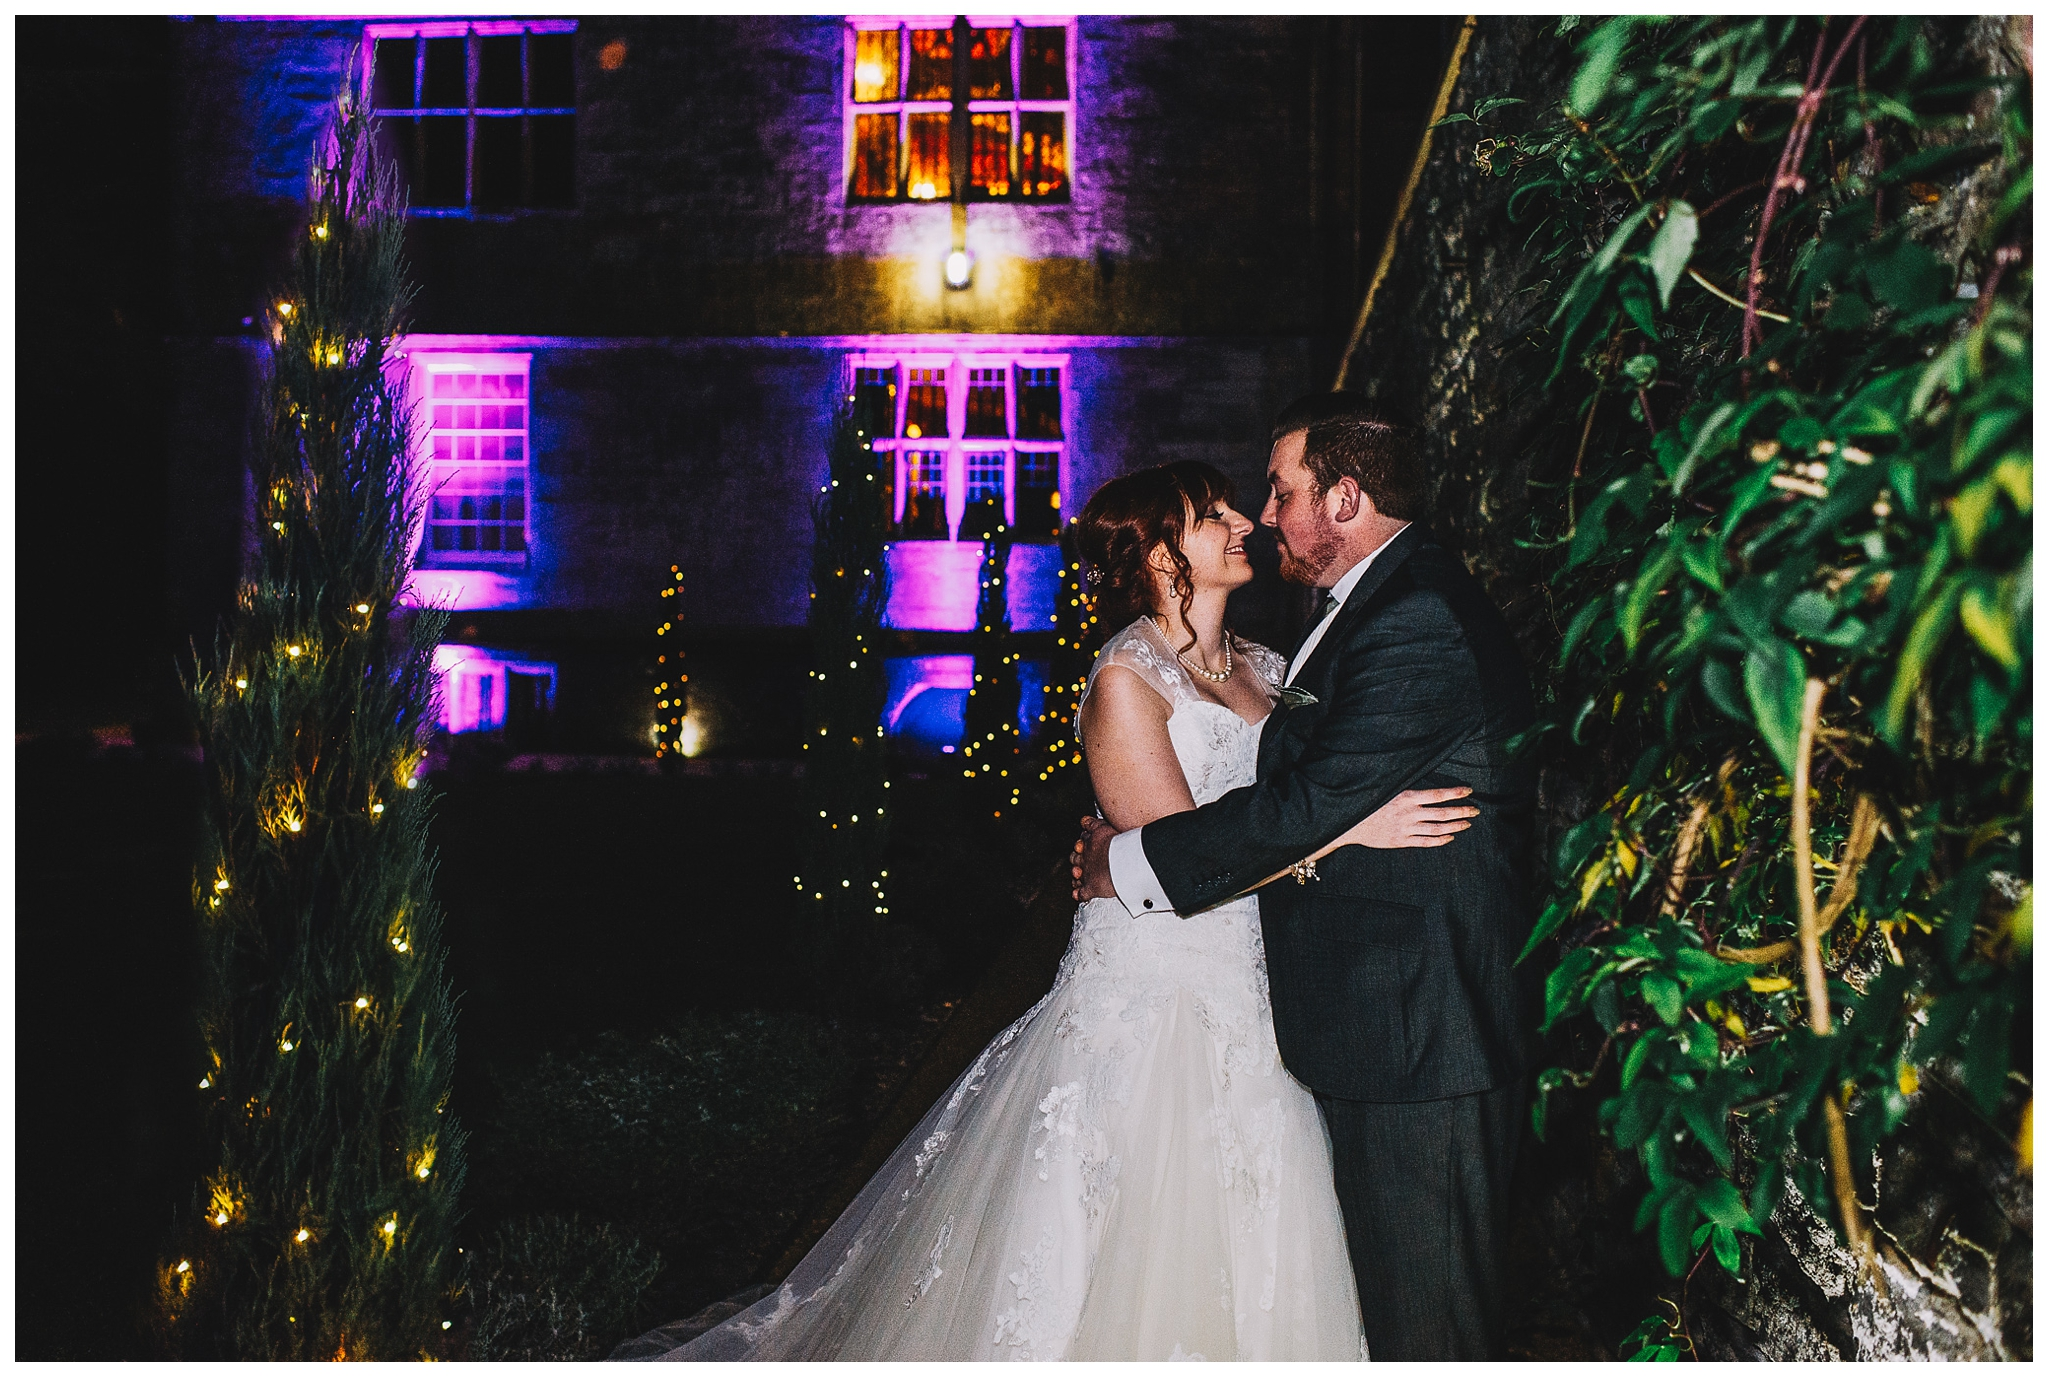 Emma&Paul-Elmore-Court-Winter-Wedding-Nikki-Cooper-Photography_0112.jpg